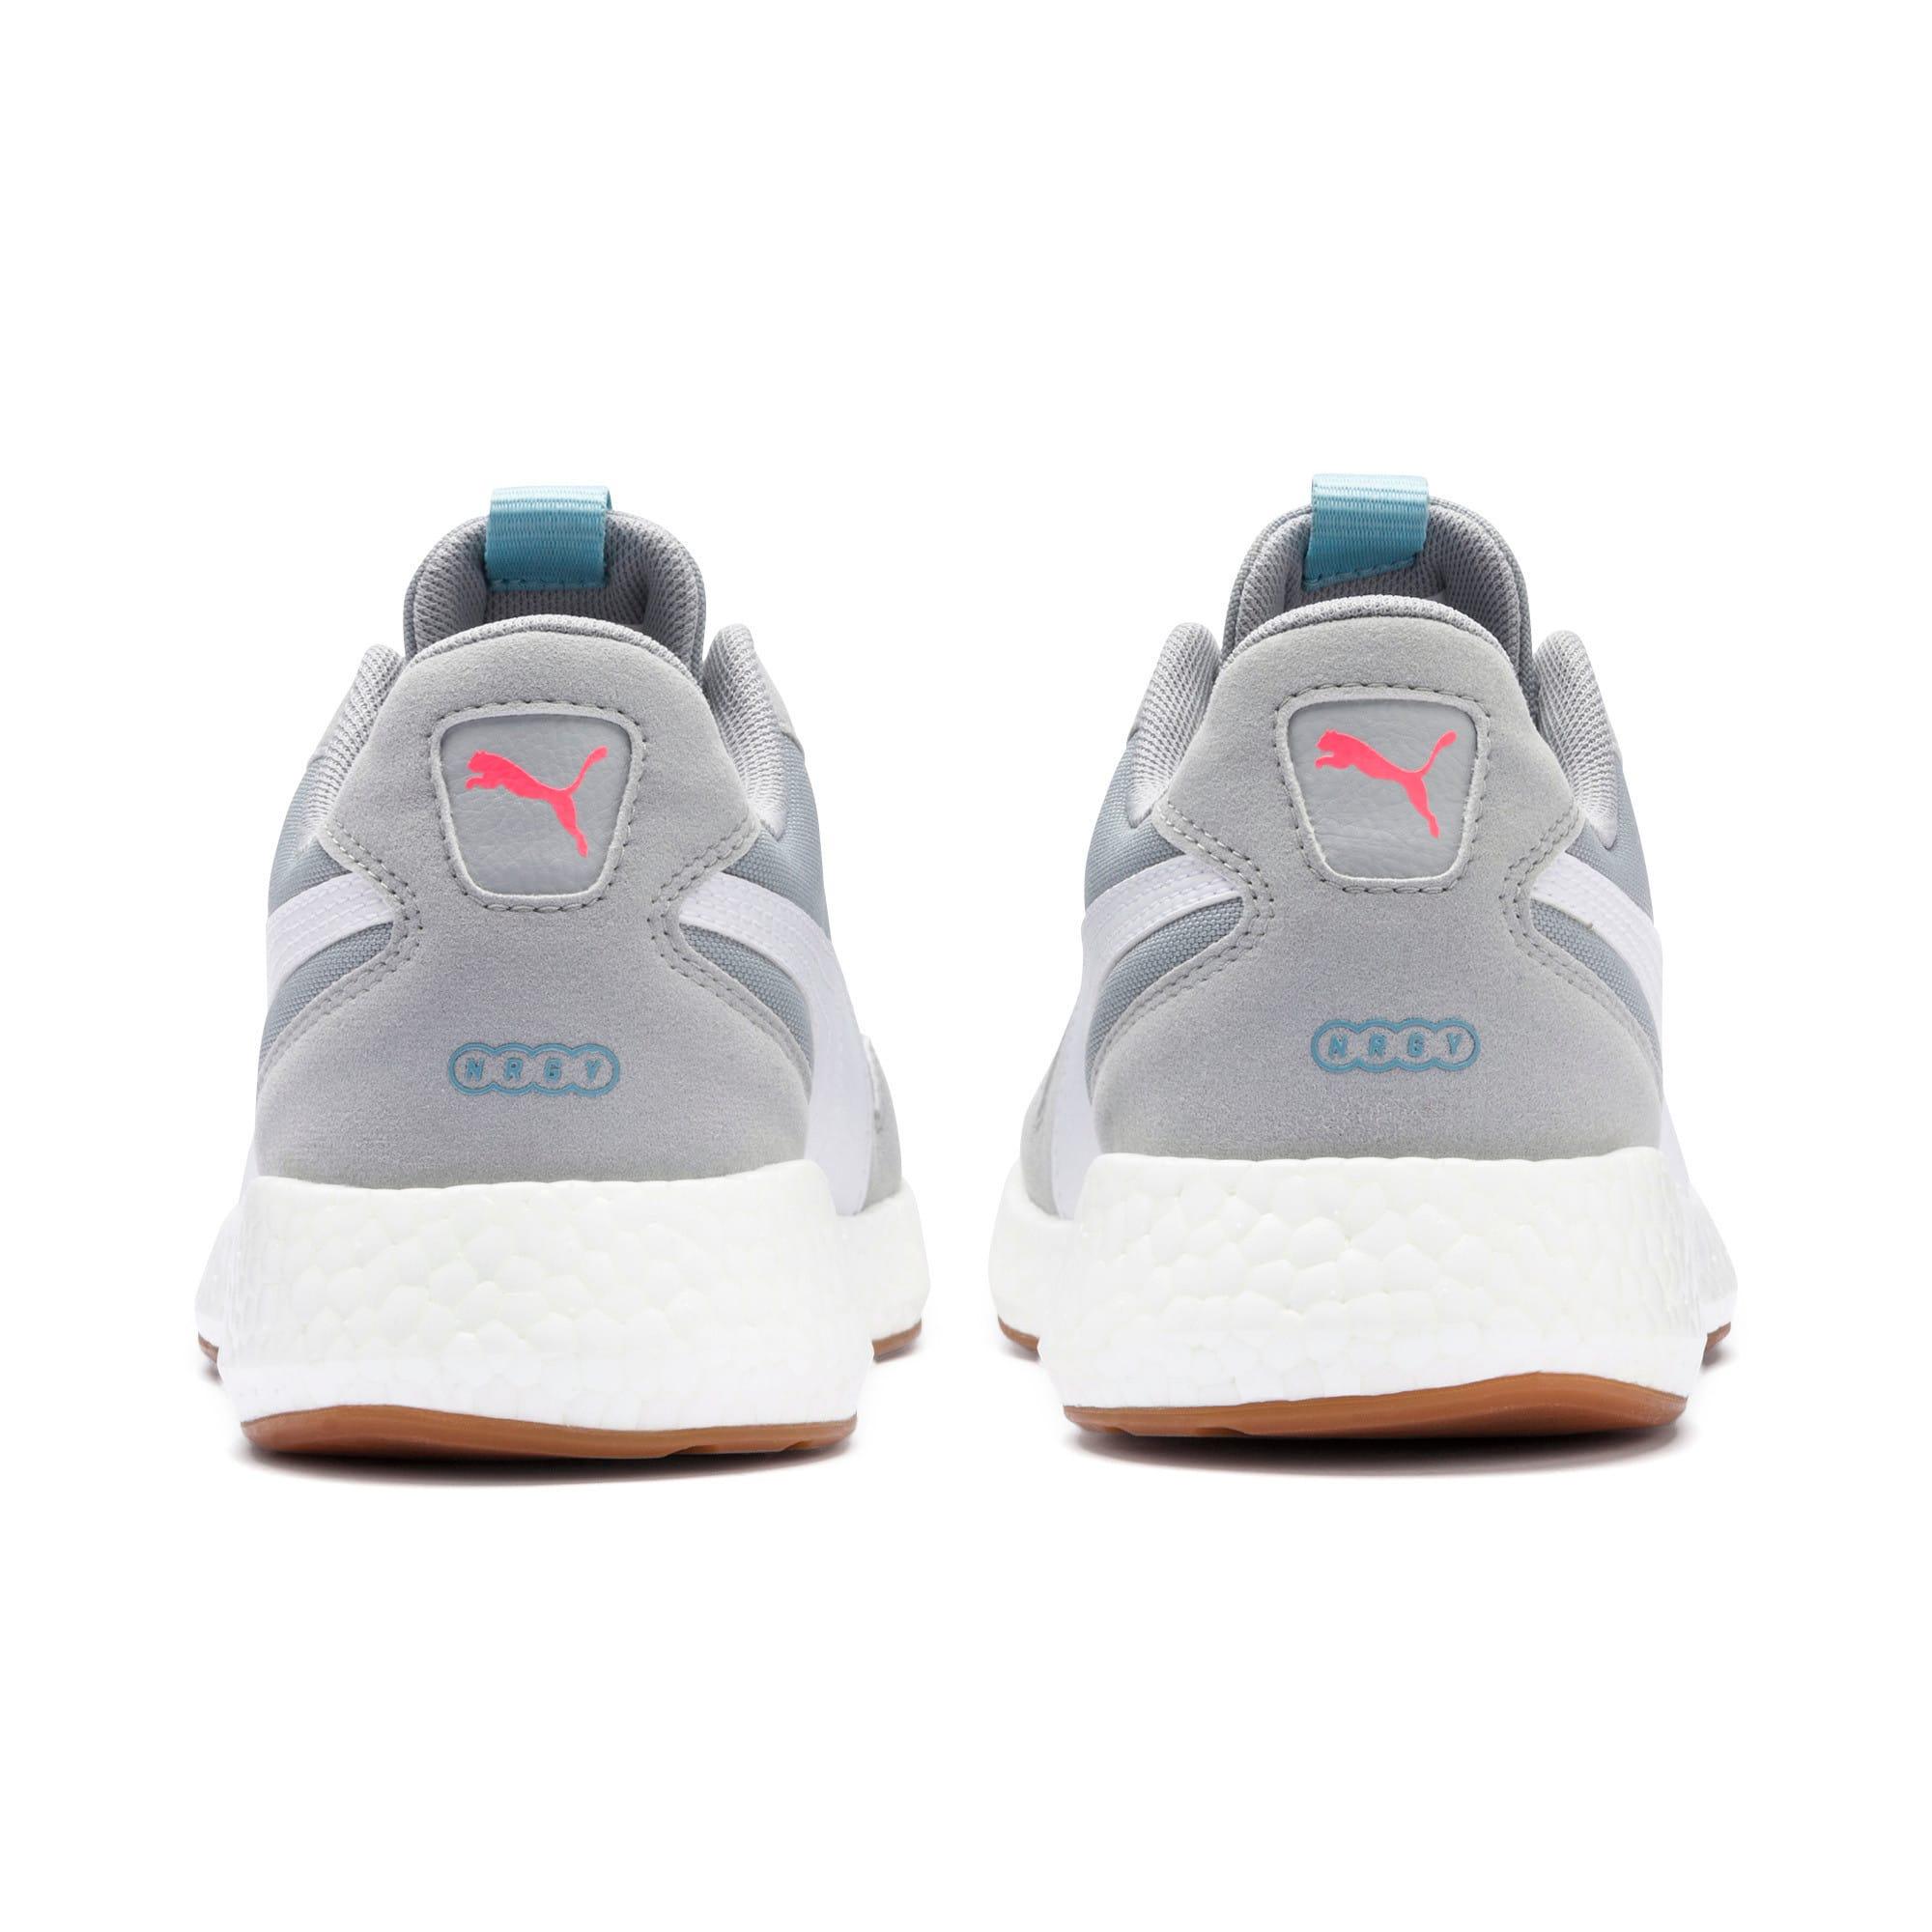 Thumbnail 5 of NRGY Neko Retro Women's Running Shoes, High Rise-Pink Alert, medium-IND